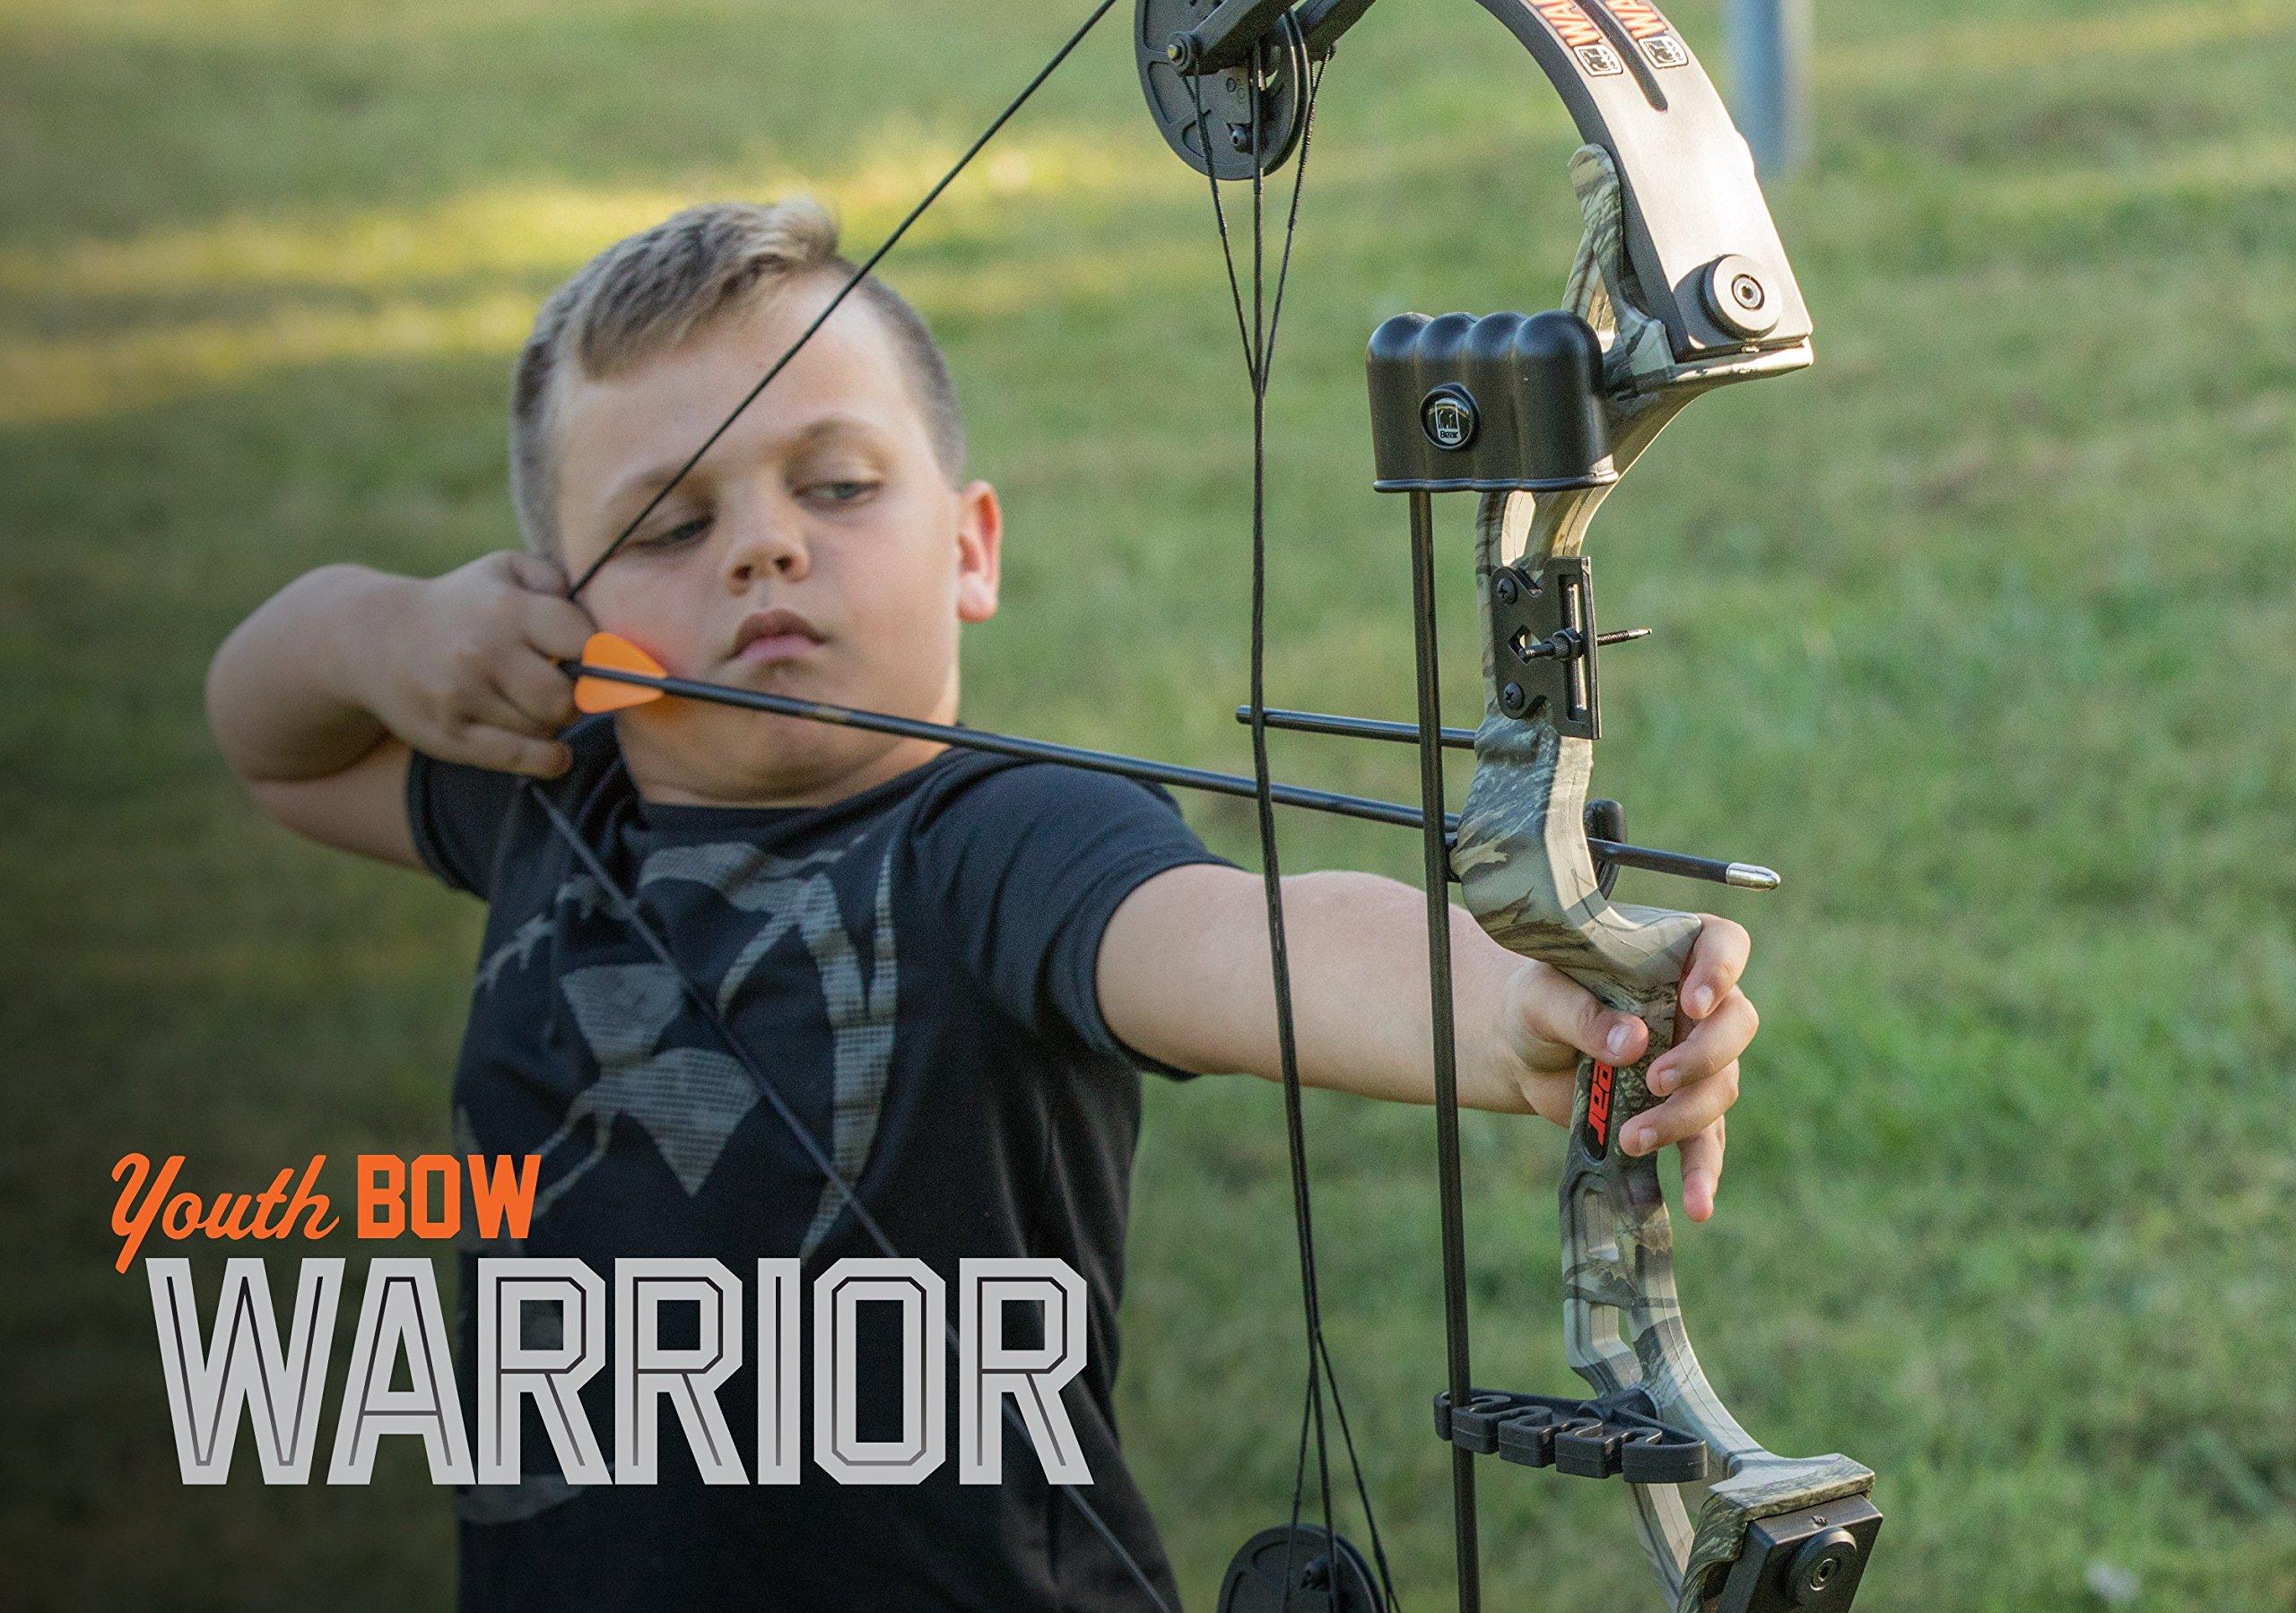 Bear Archery Warrior Youth Bow by Bear Archery (Image #2)